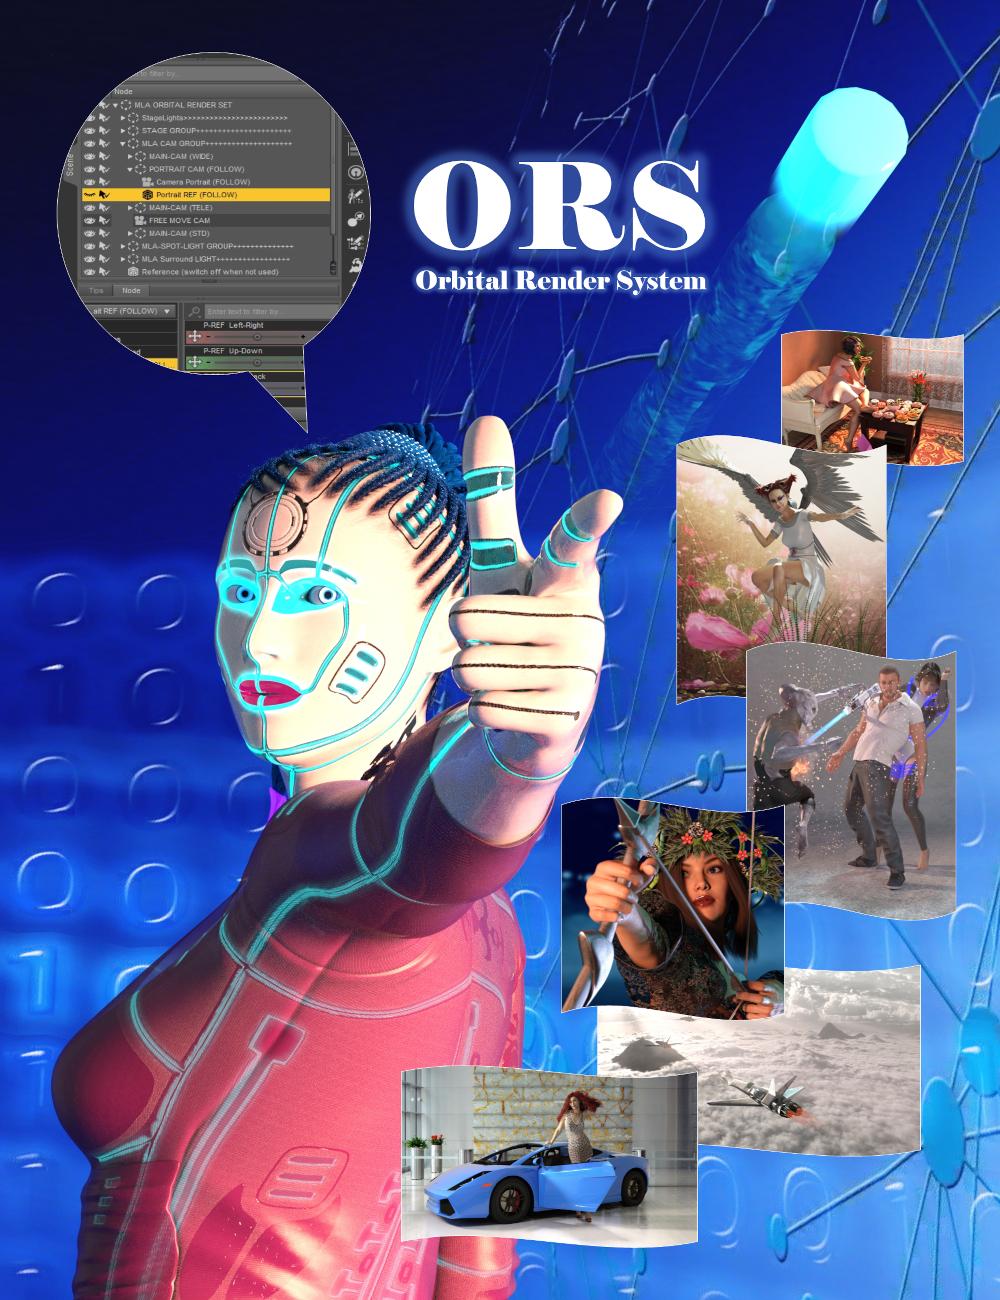 MLA Orbital Render System by: michaleuart, 3D Models by Daz 3D